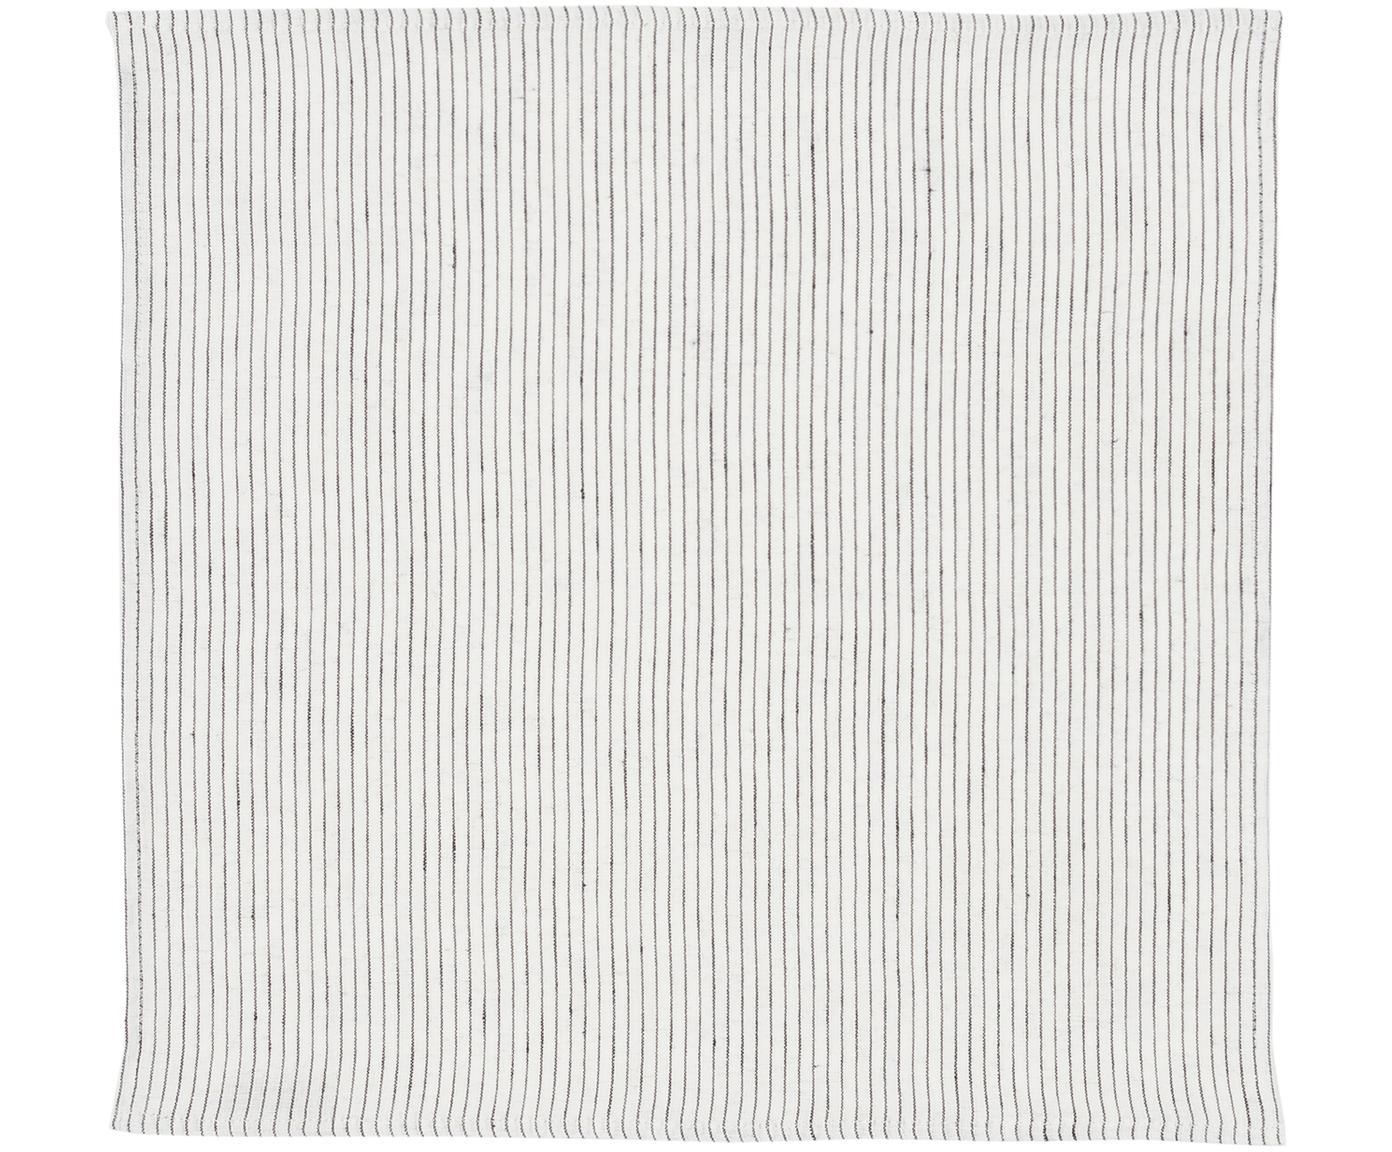 Linnen servetten Svete, 6 stuks, Crèmewit, zwart, 43 x 43 cm